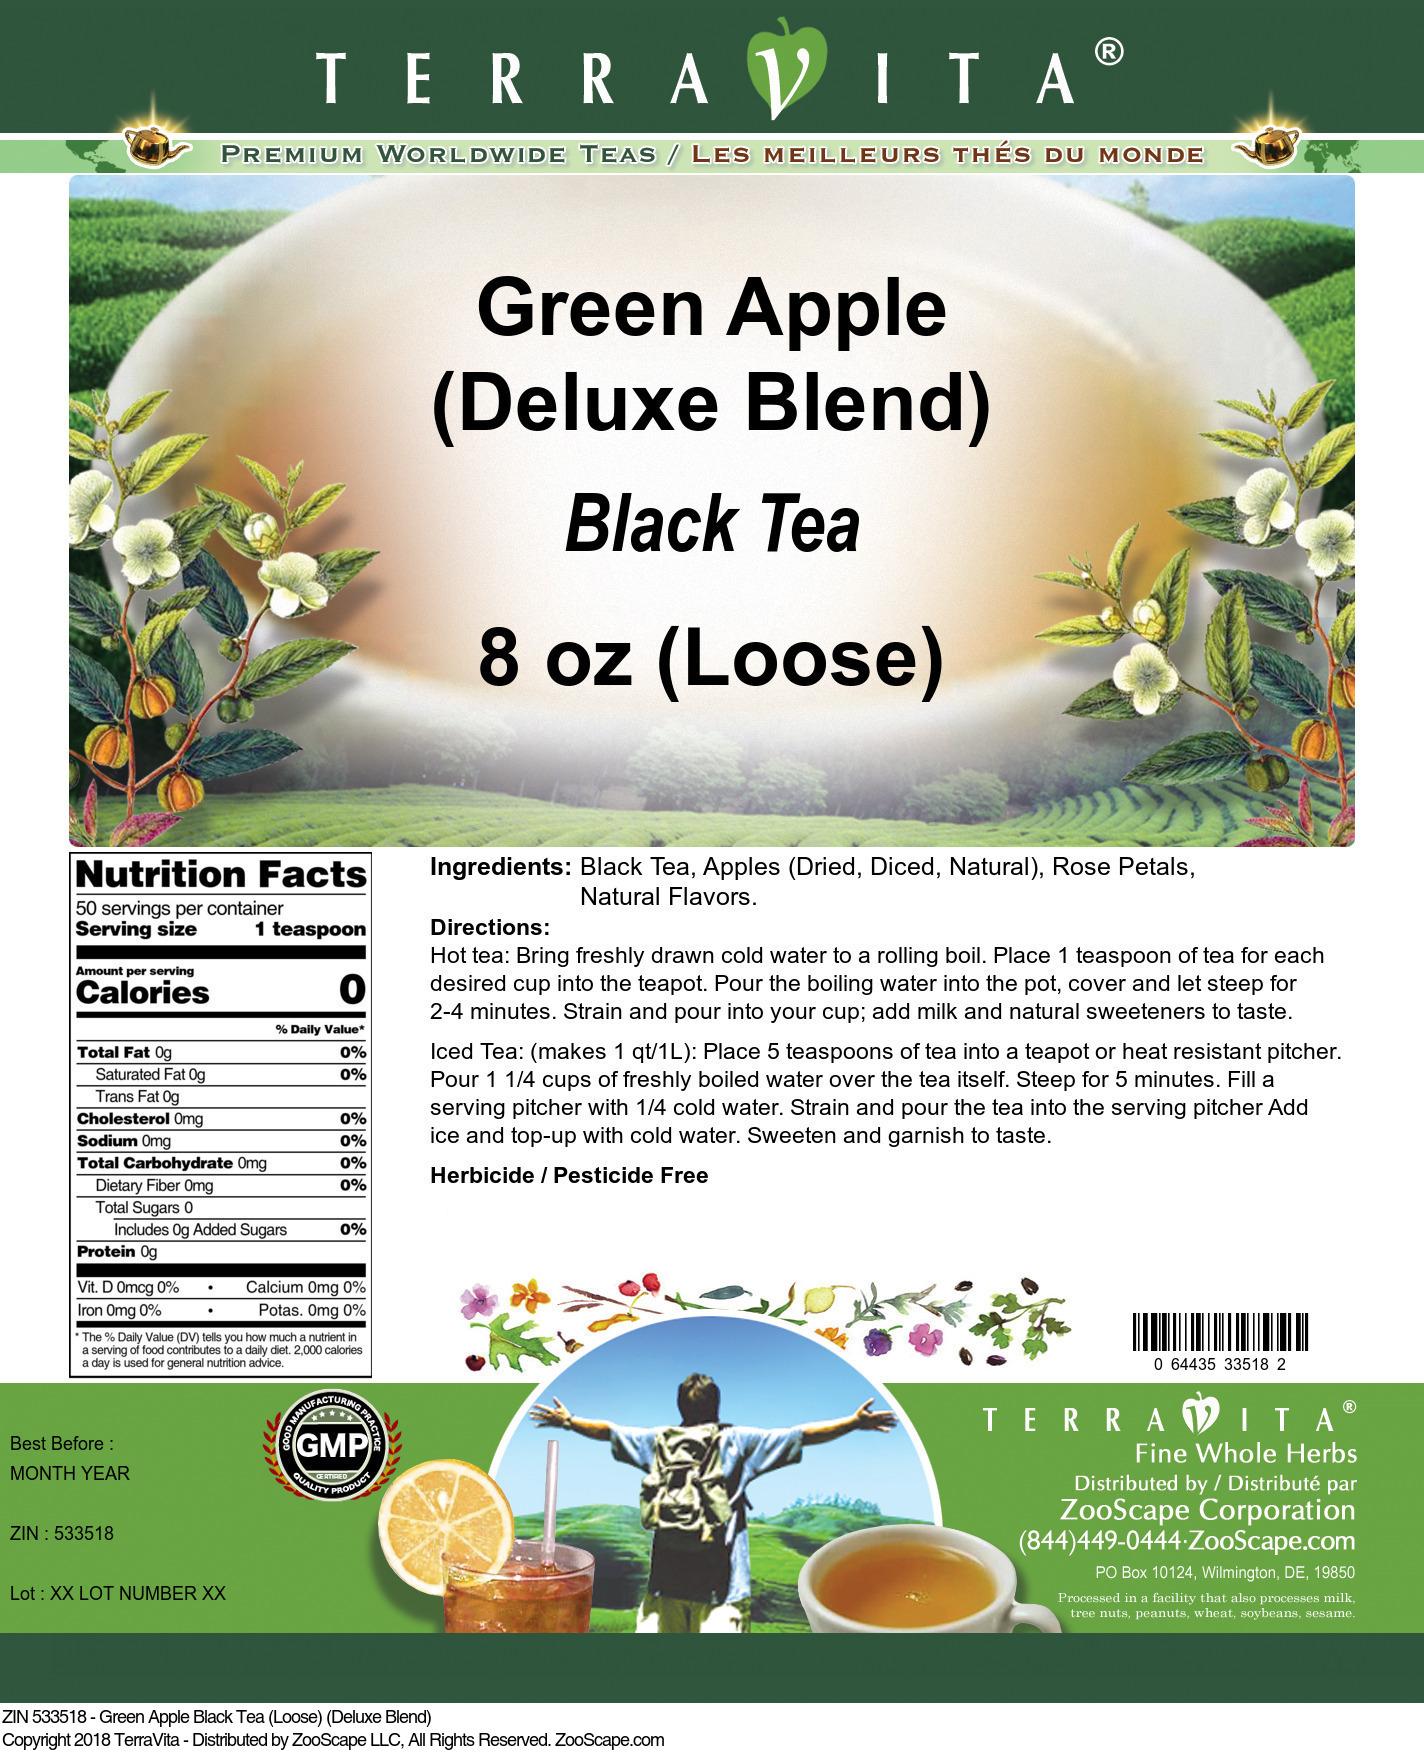 Green Apple Black Tea (Loose) (Deluxe Blend)